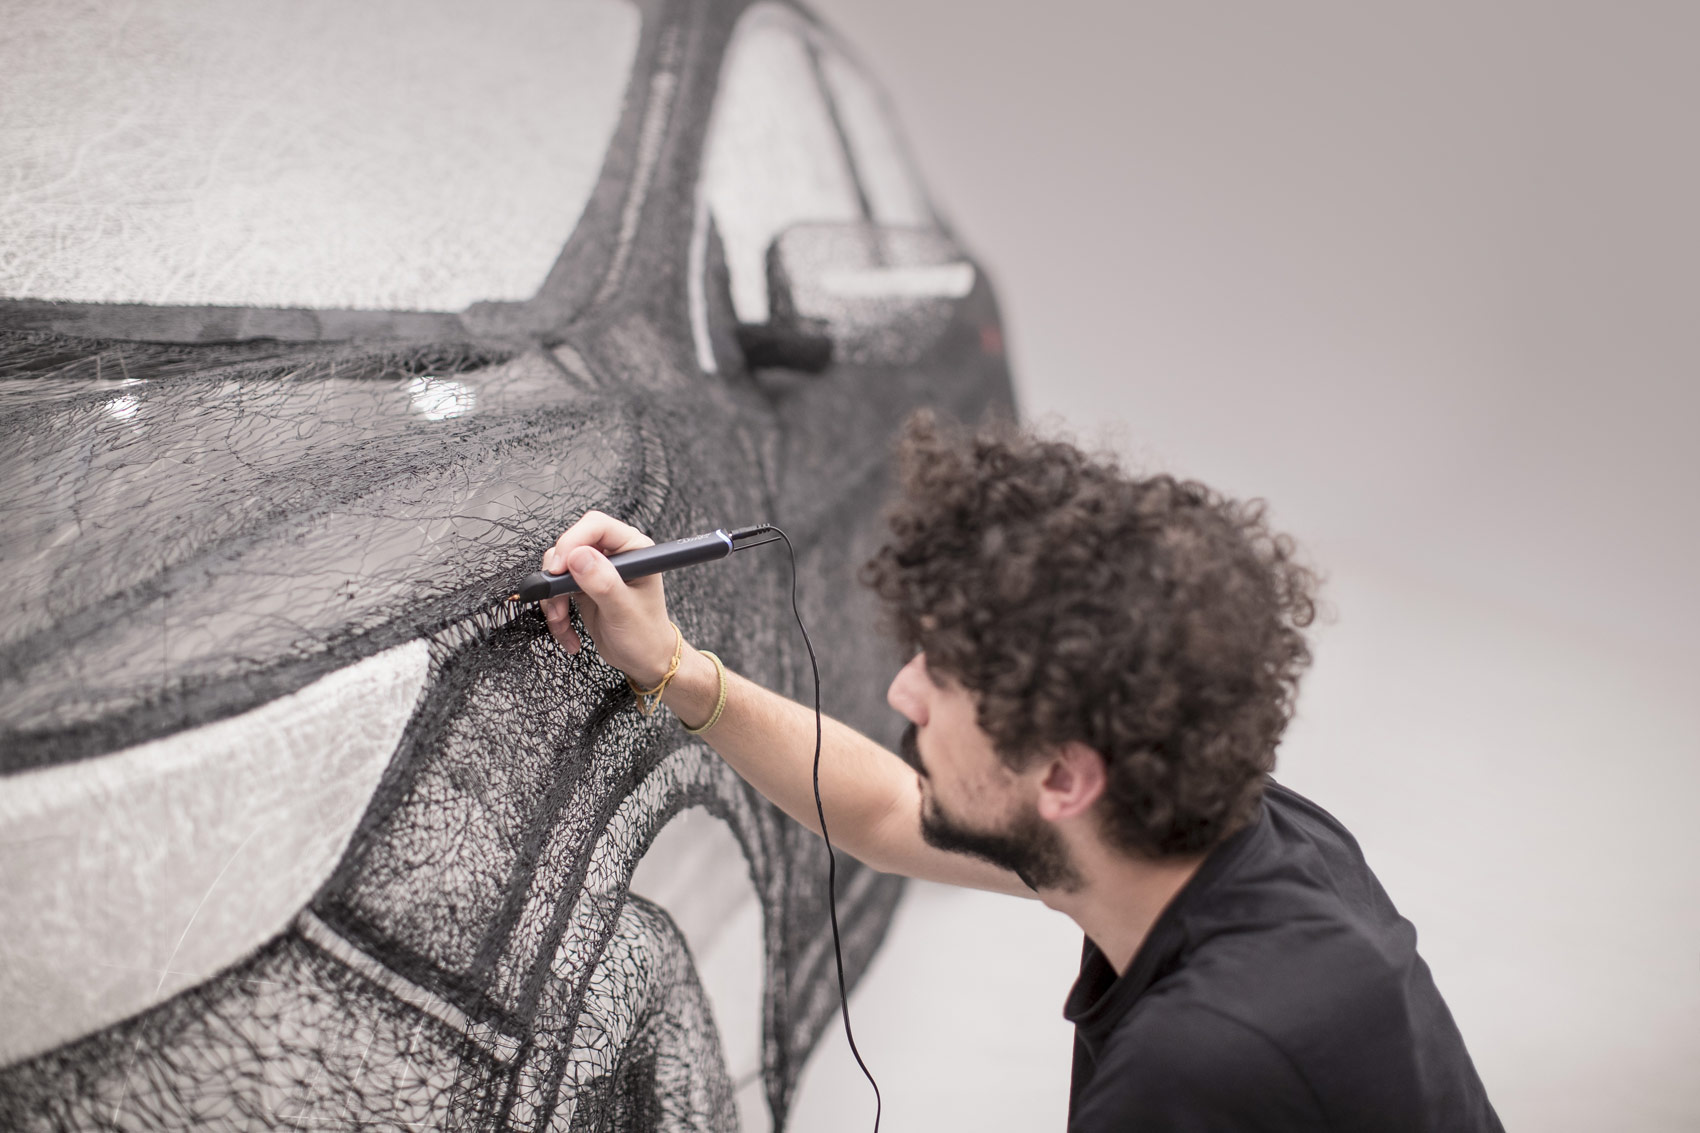 Nissan-Qashqai-Black-Edition-3Doodler-3D-Pen-2